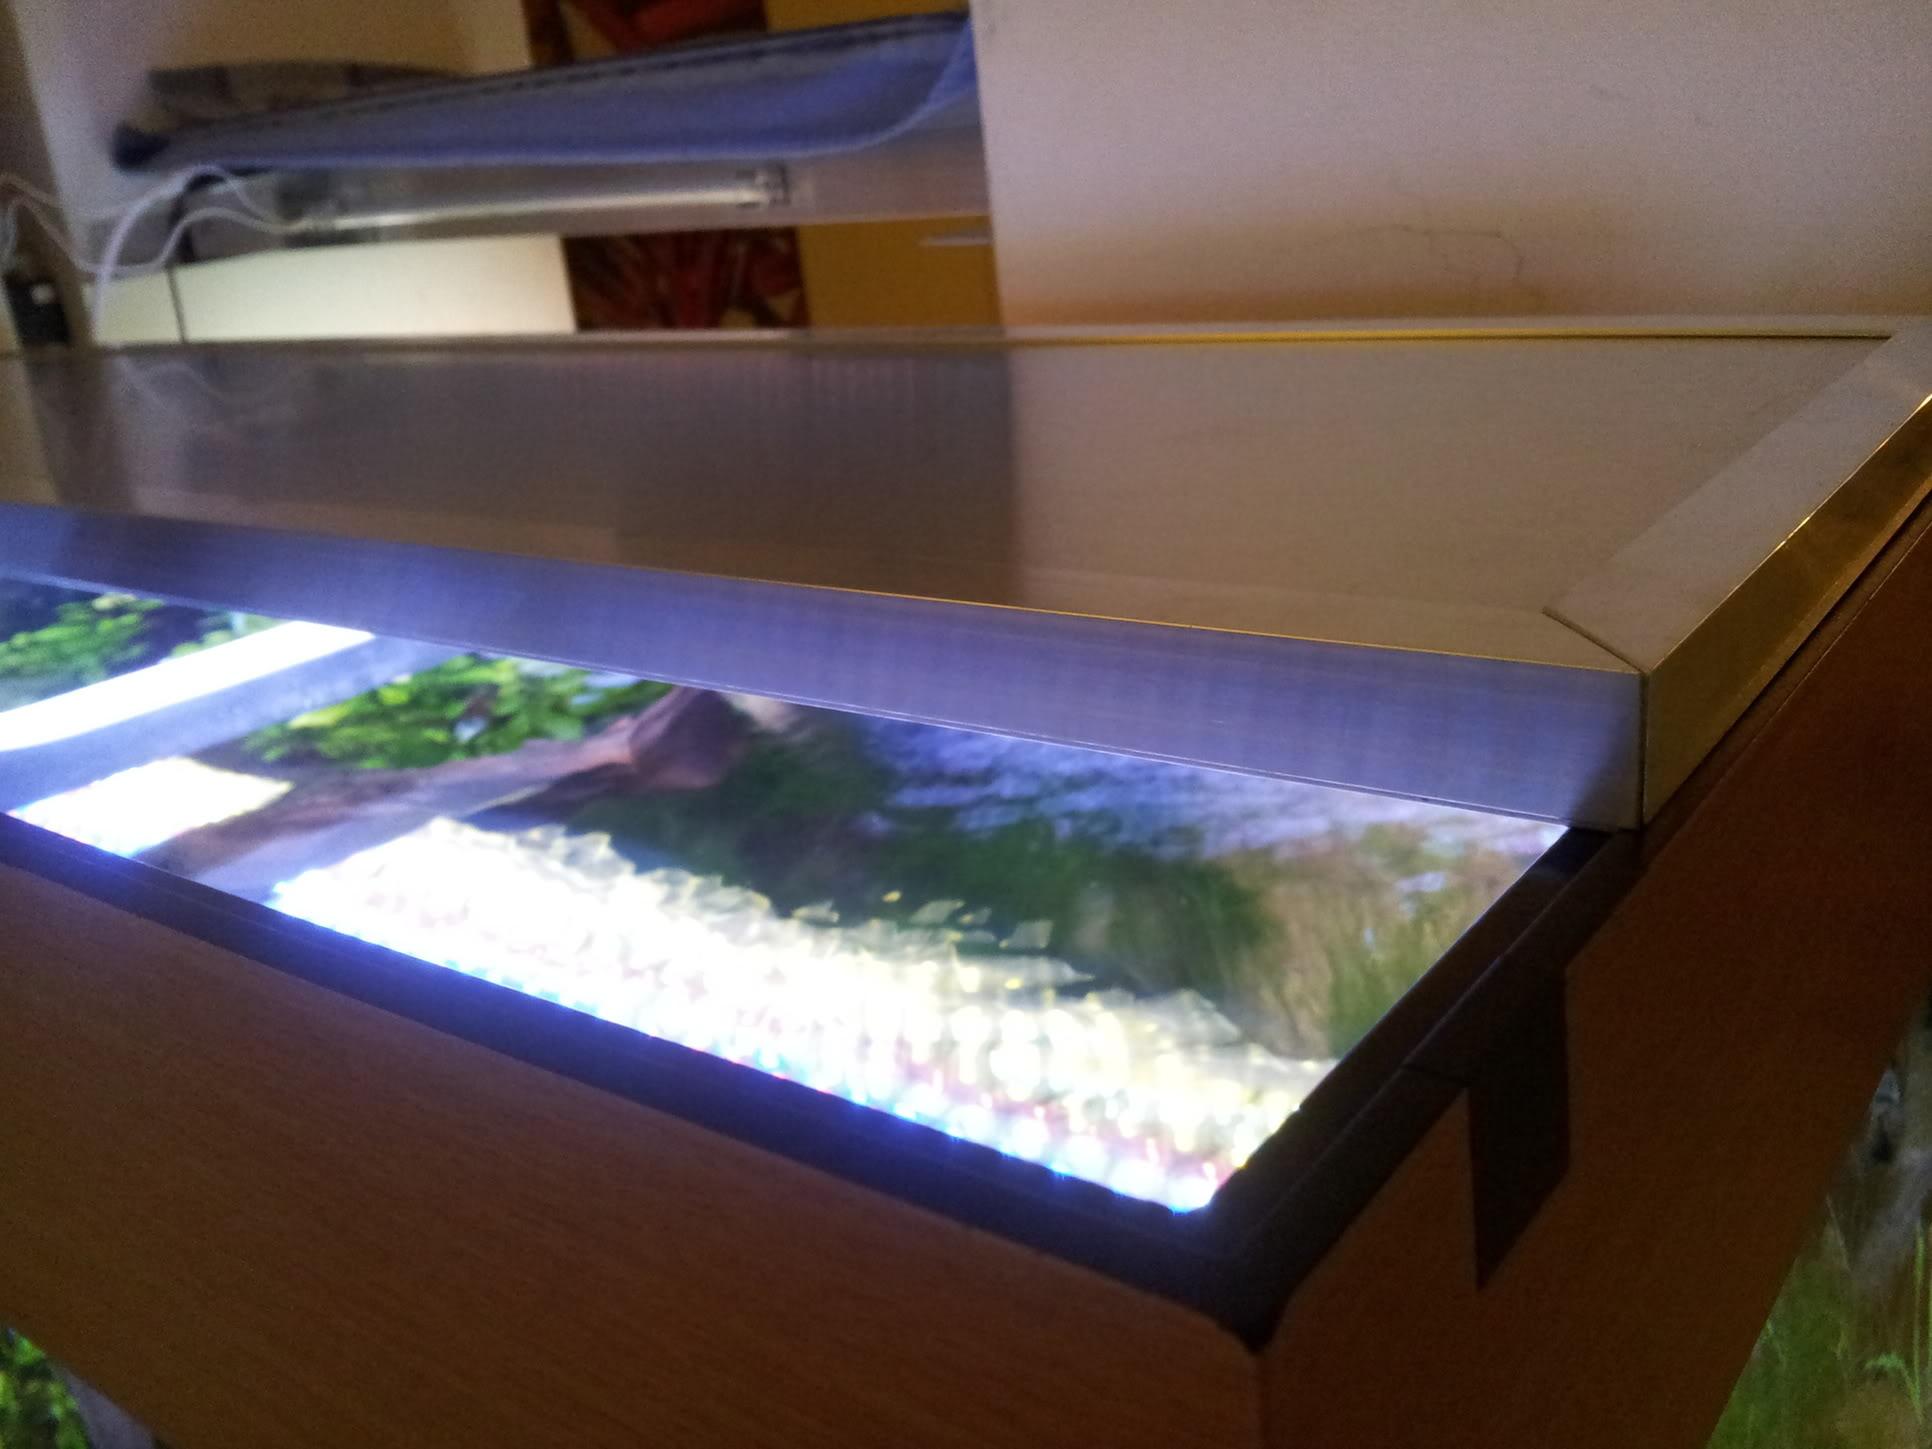 Fabrication galerie LED pour Juwel rio 125 (80cmx20cmx1.8cm) 20120715_205707